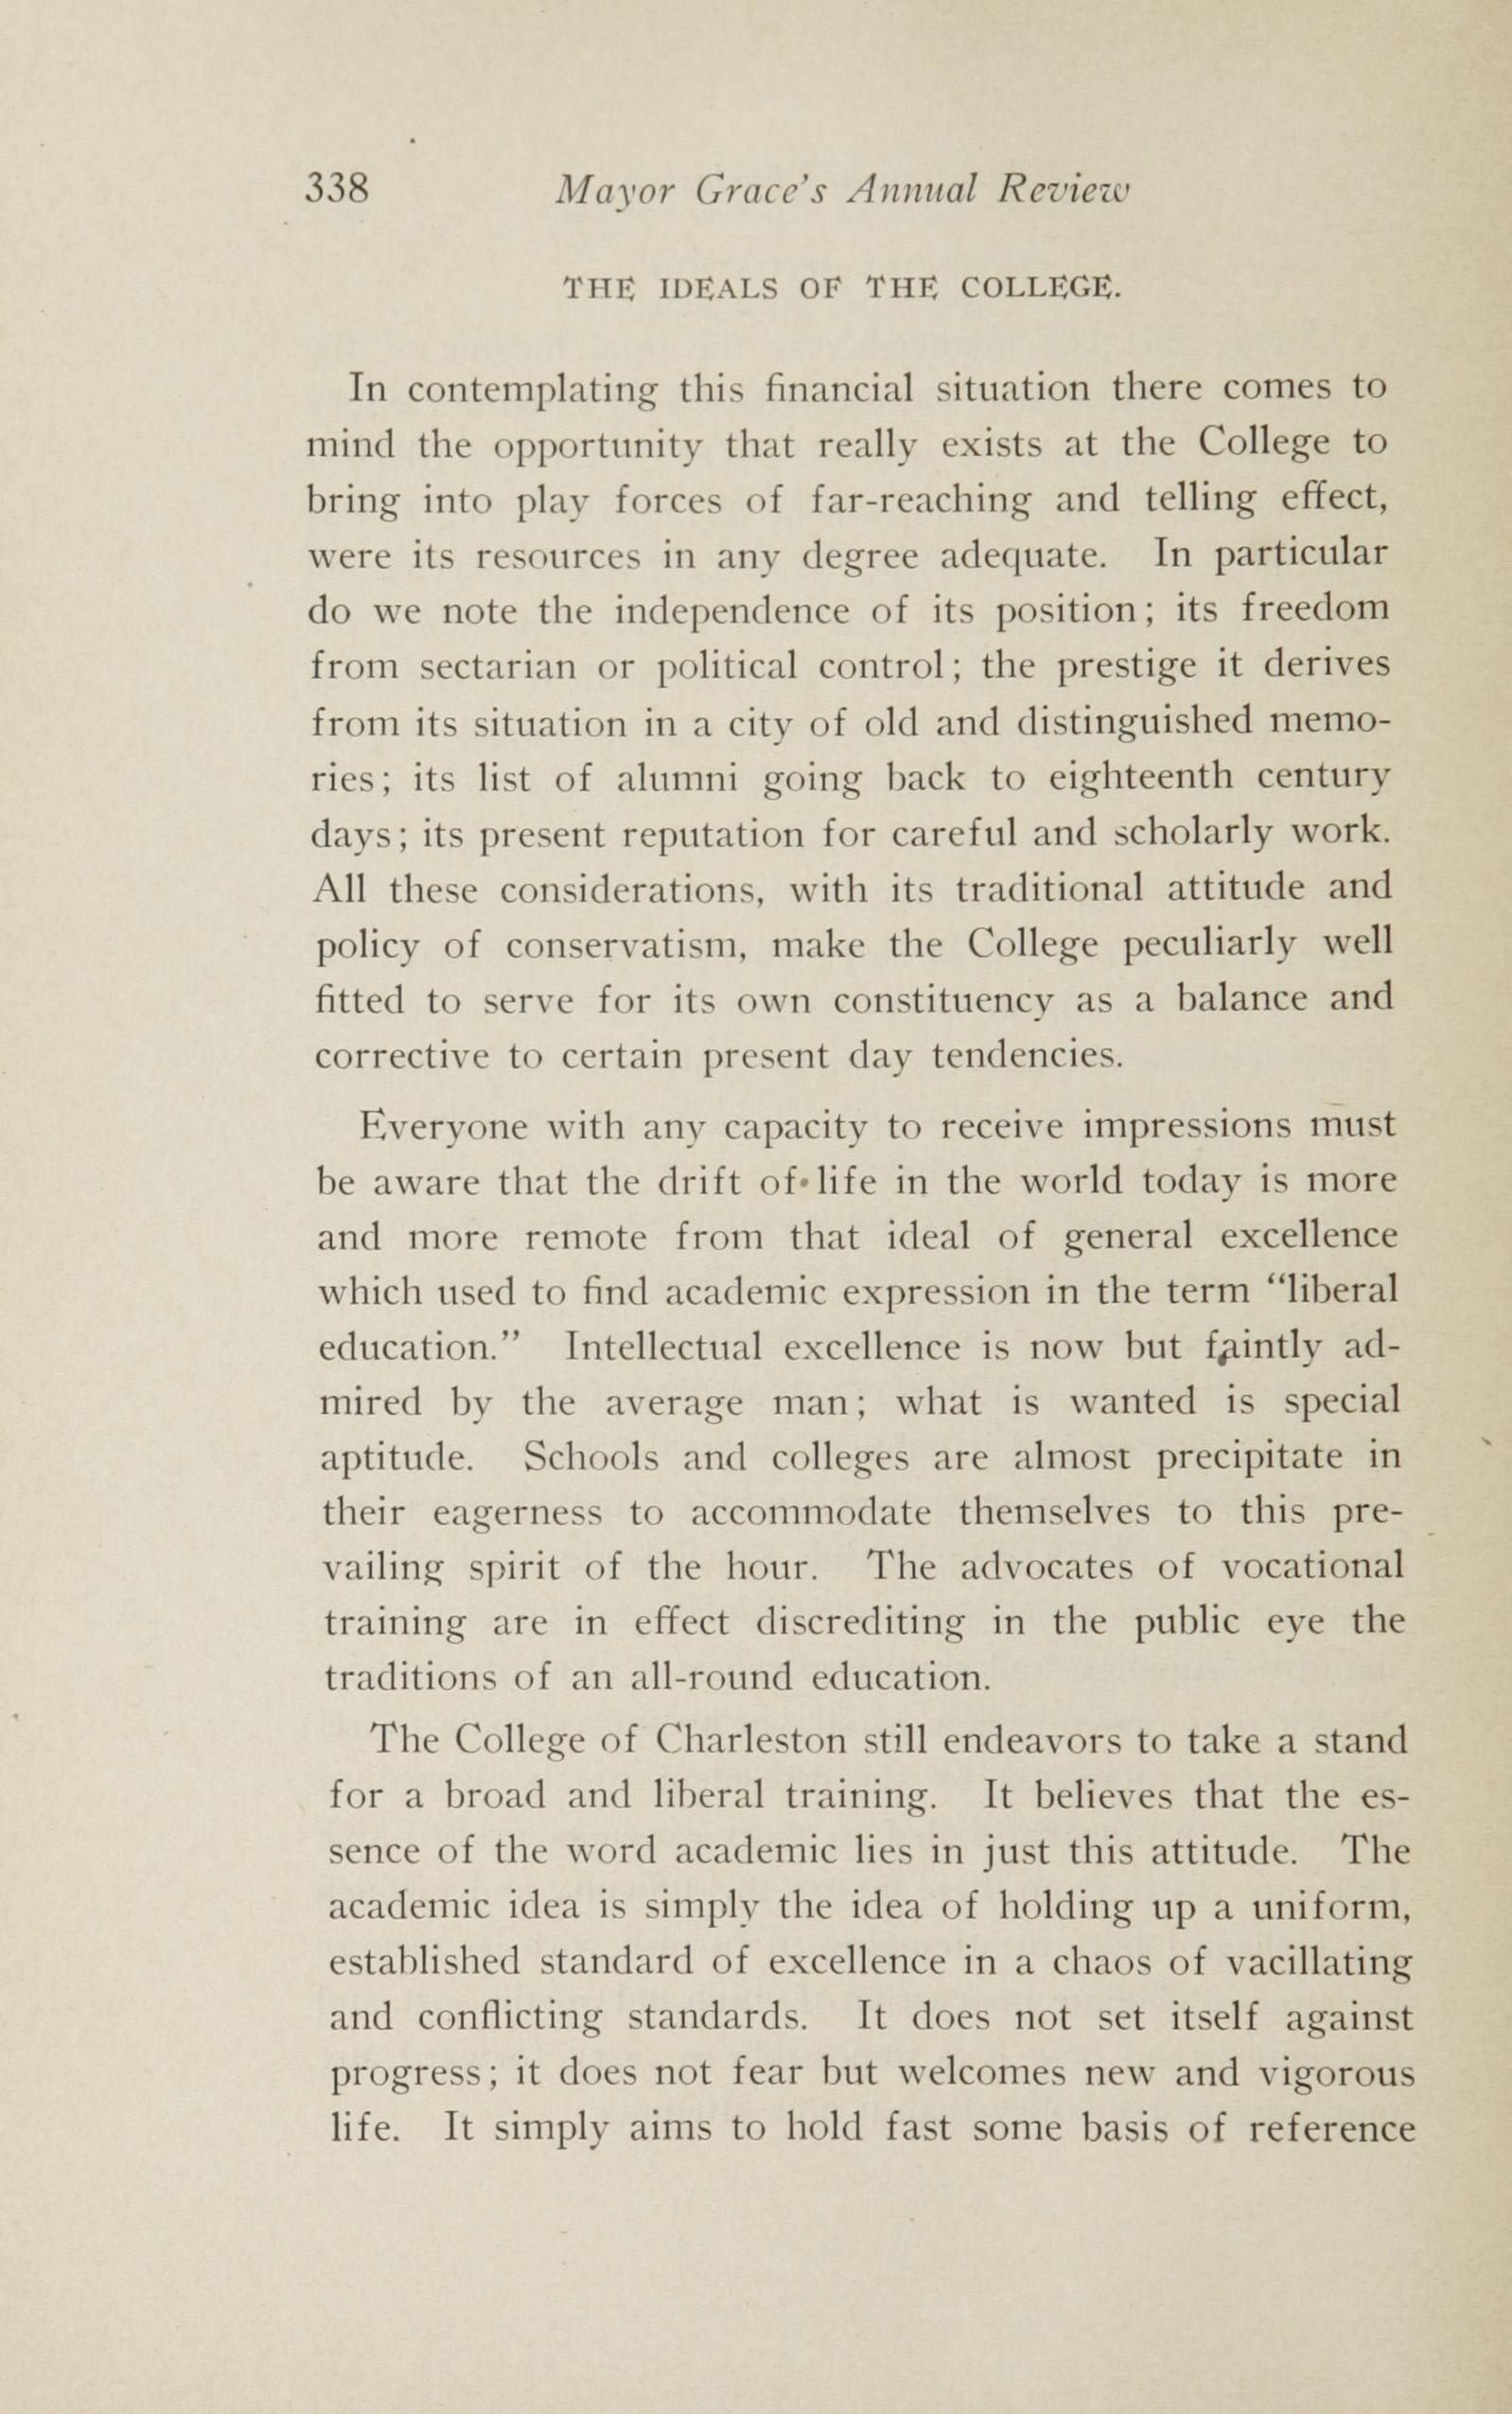 Charleston Yearbook, 1913, page 338